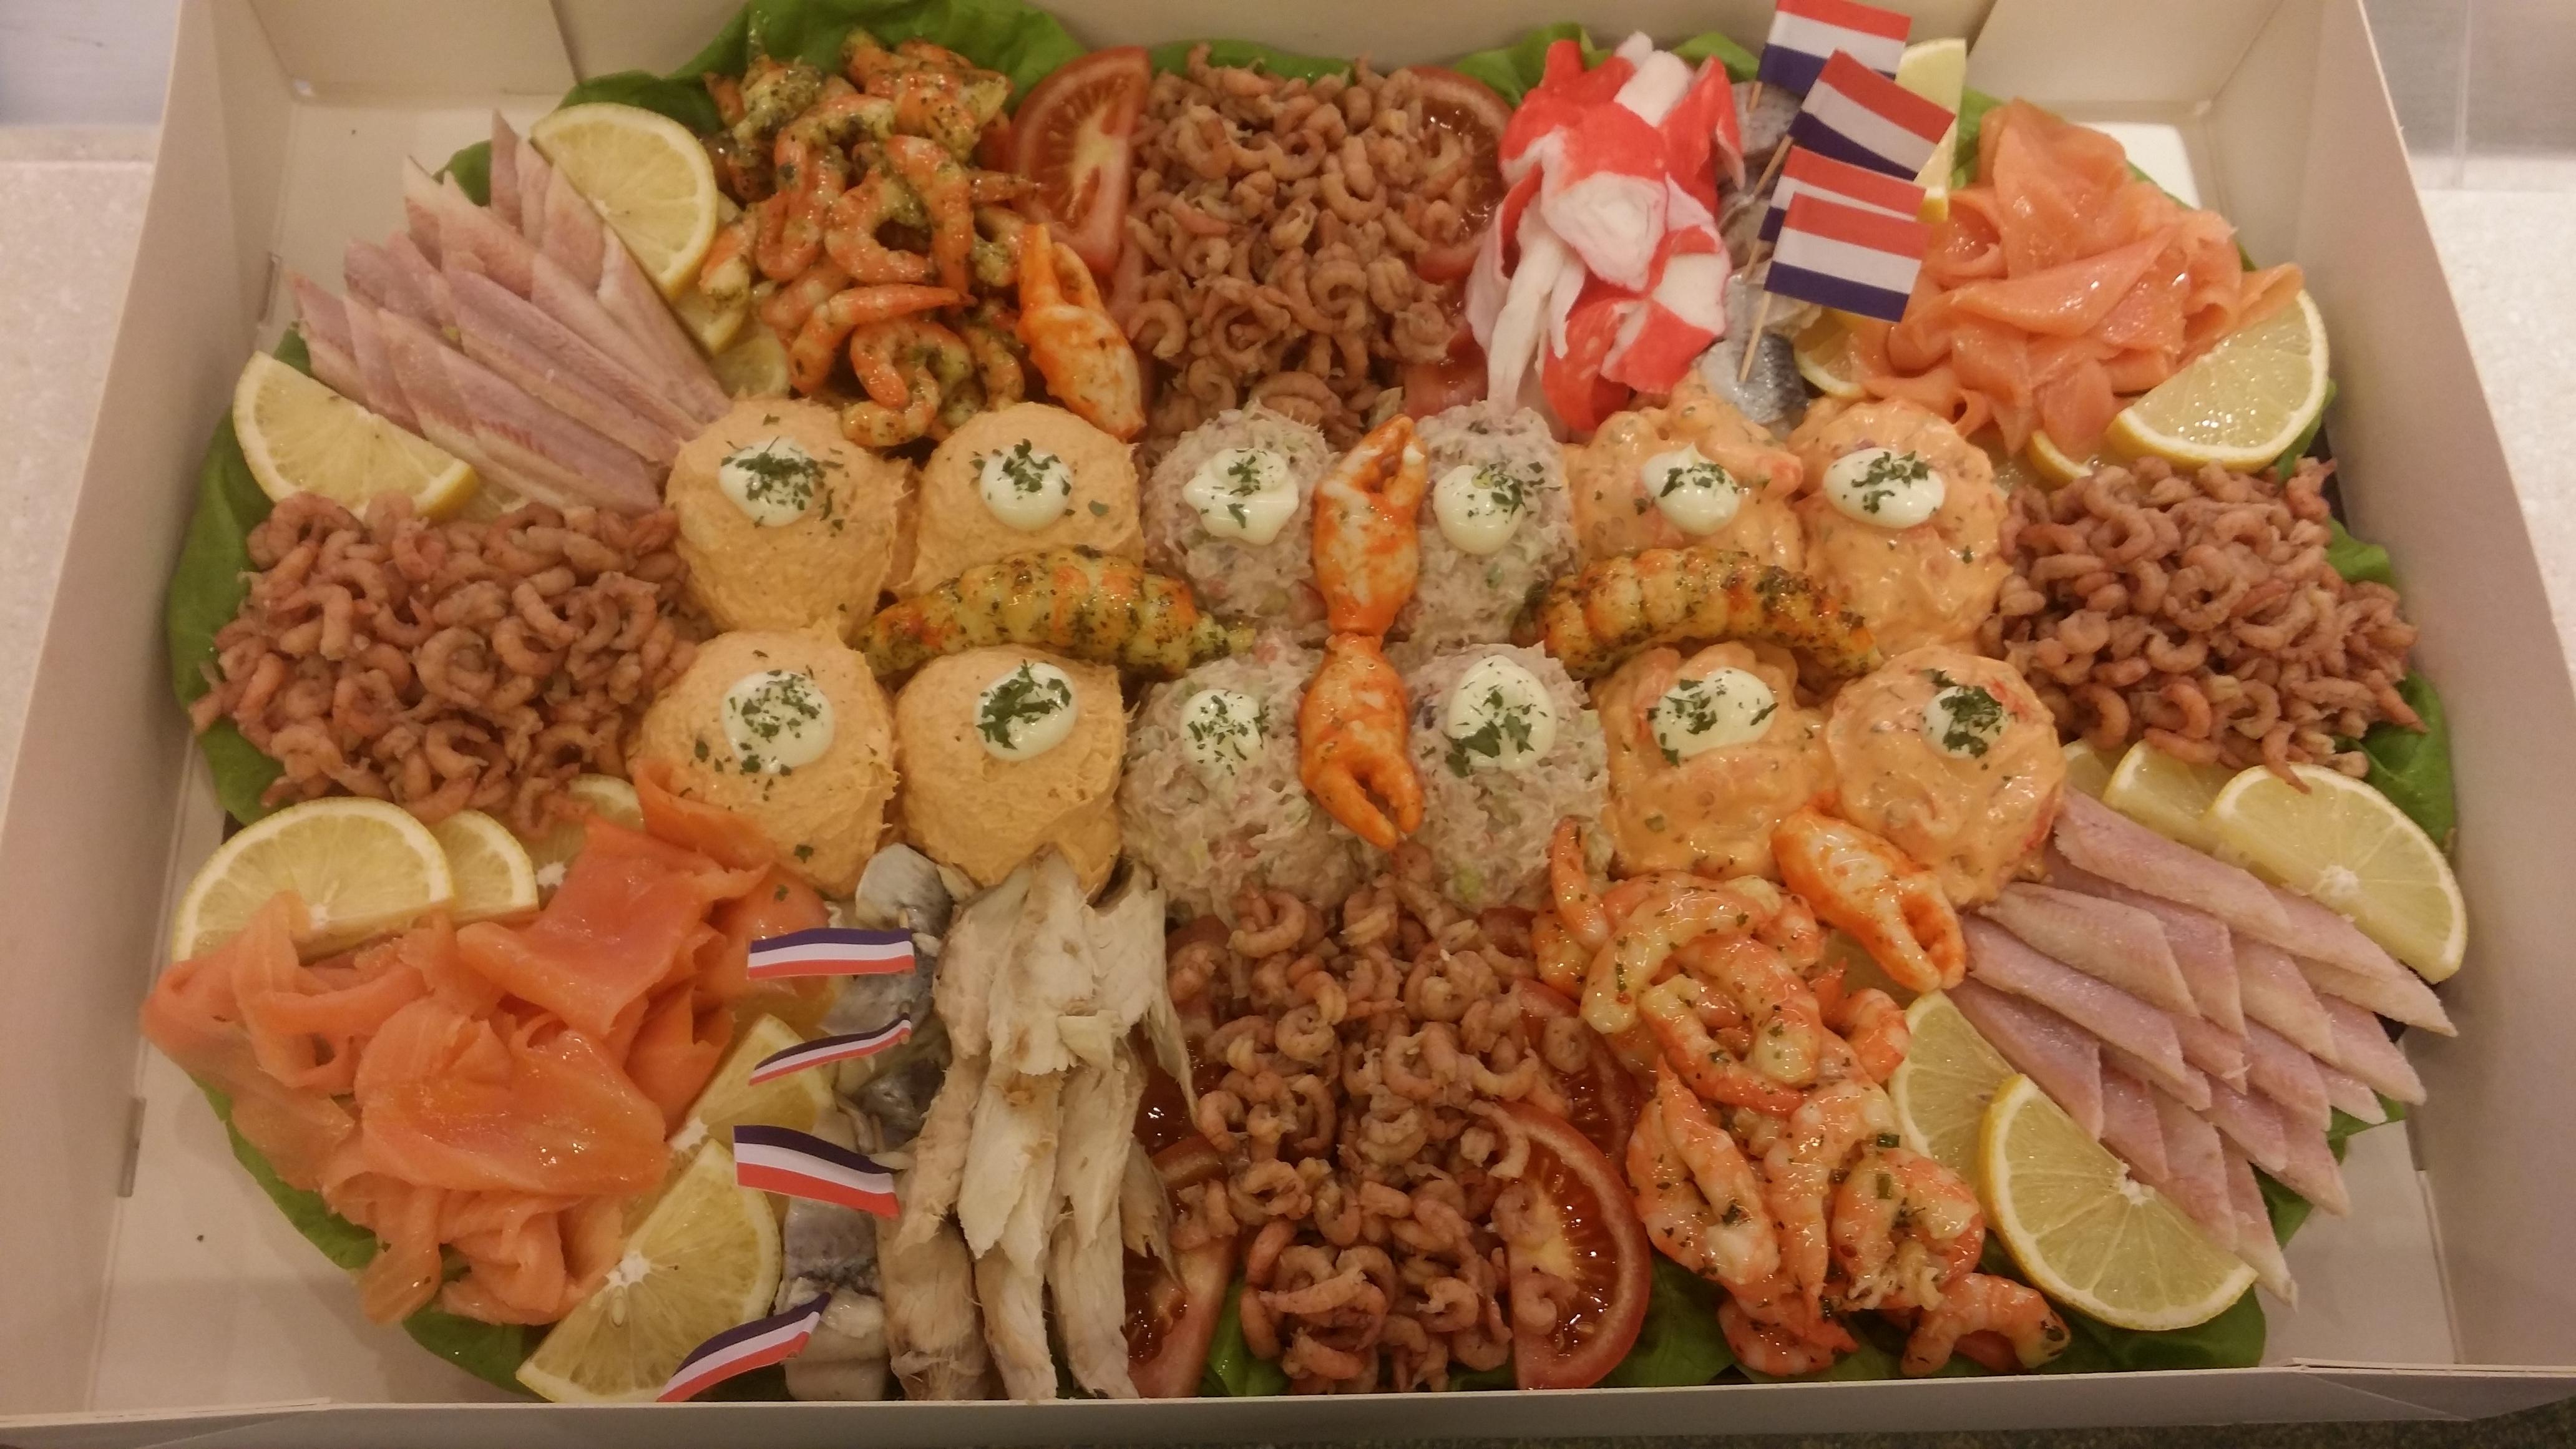 Zalm/Tonijn/Garnalen Salade SCHOTEL 10-15 PERSONEN